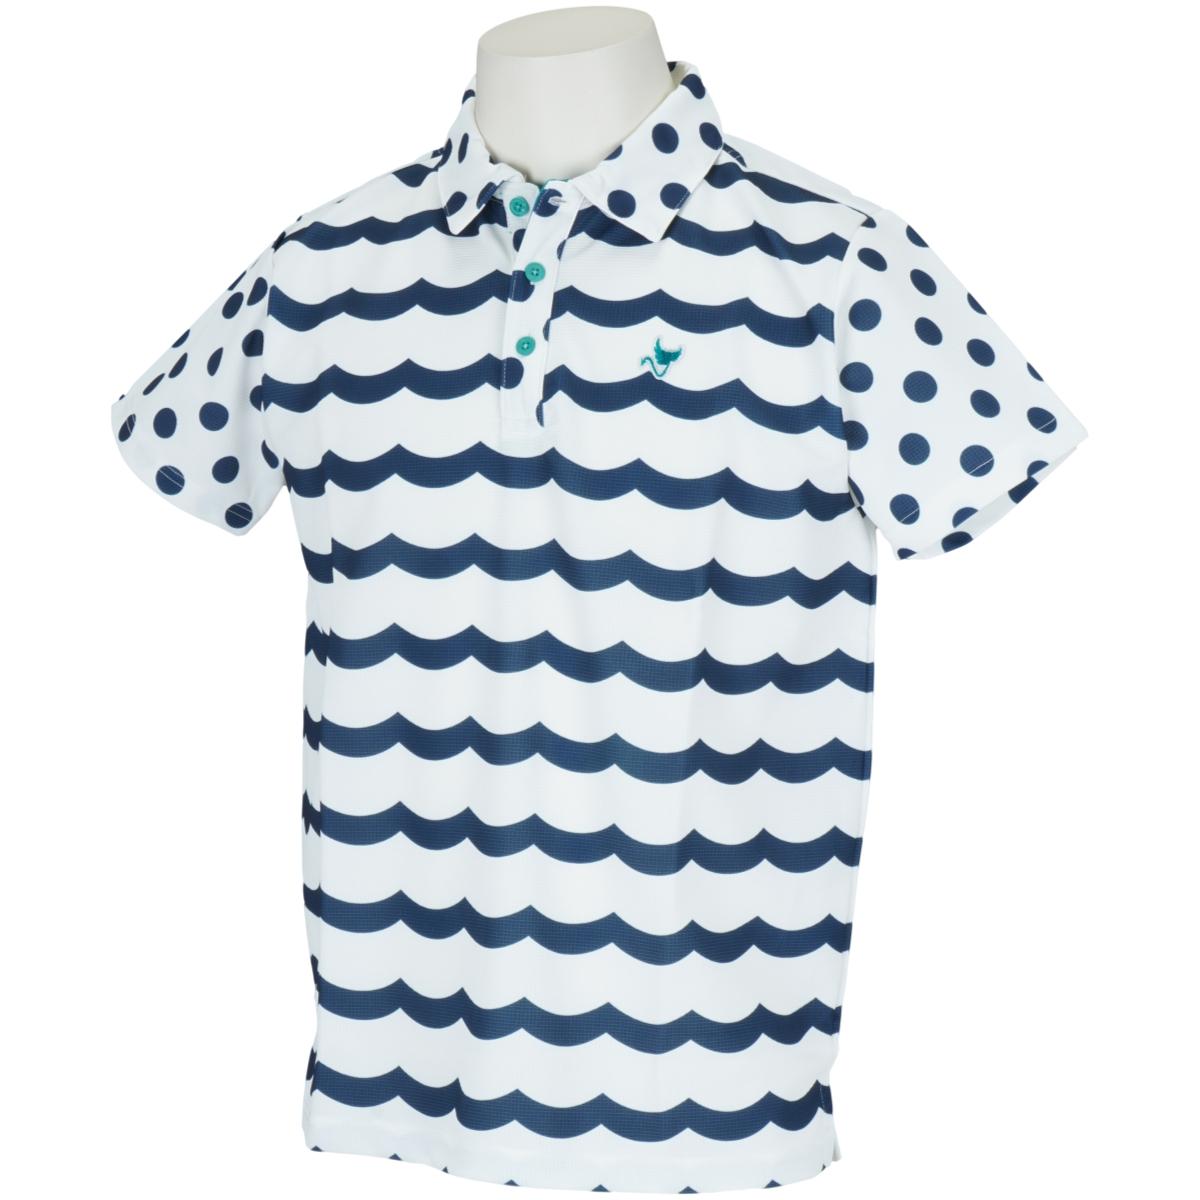 WAVEボーダー半袖ポロシャツ